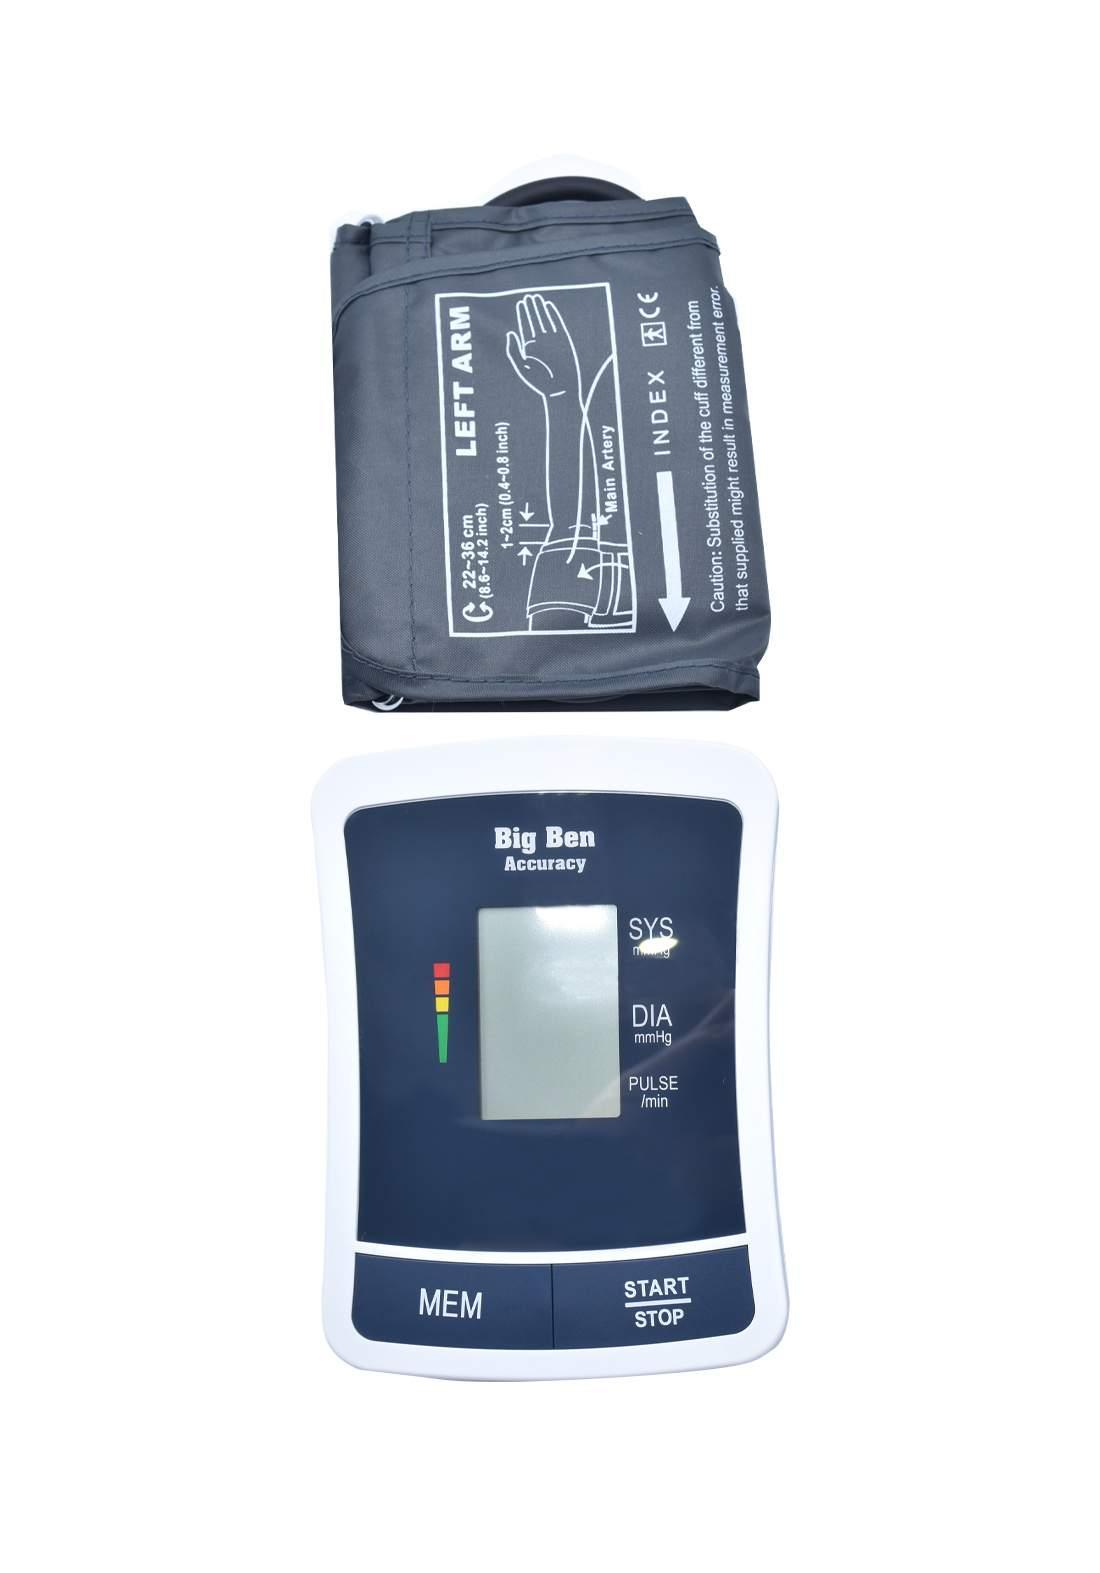 Big Ben BA35 Blood Pressure Monitor جهاز قياس ضغط الدم